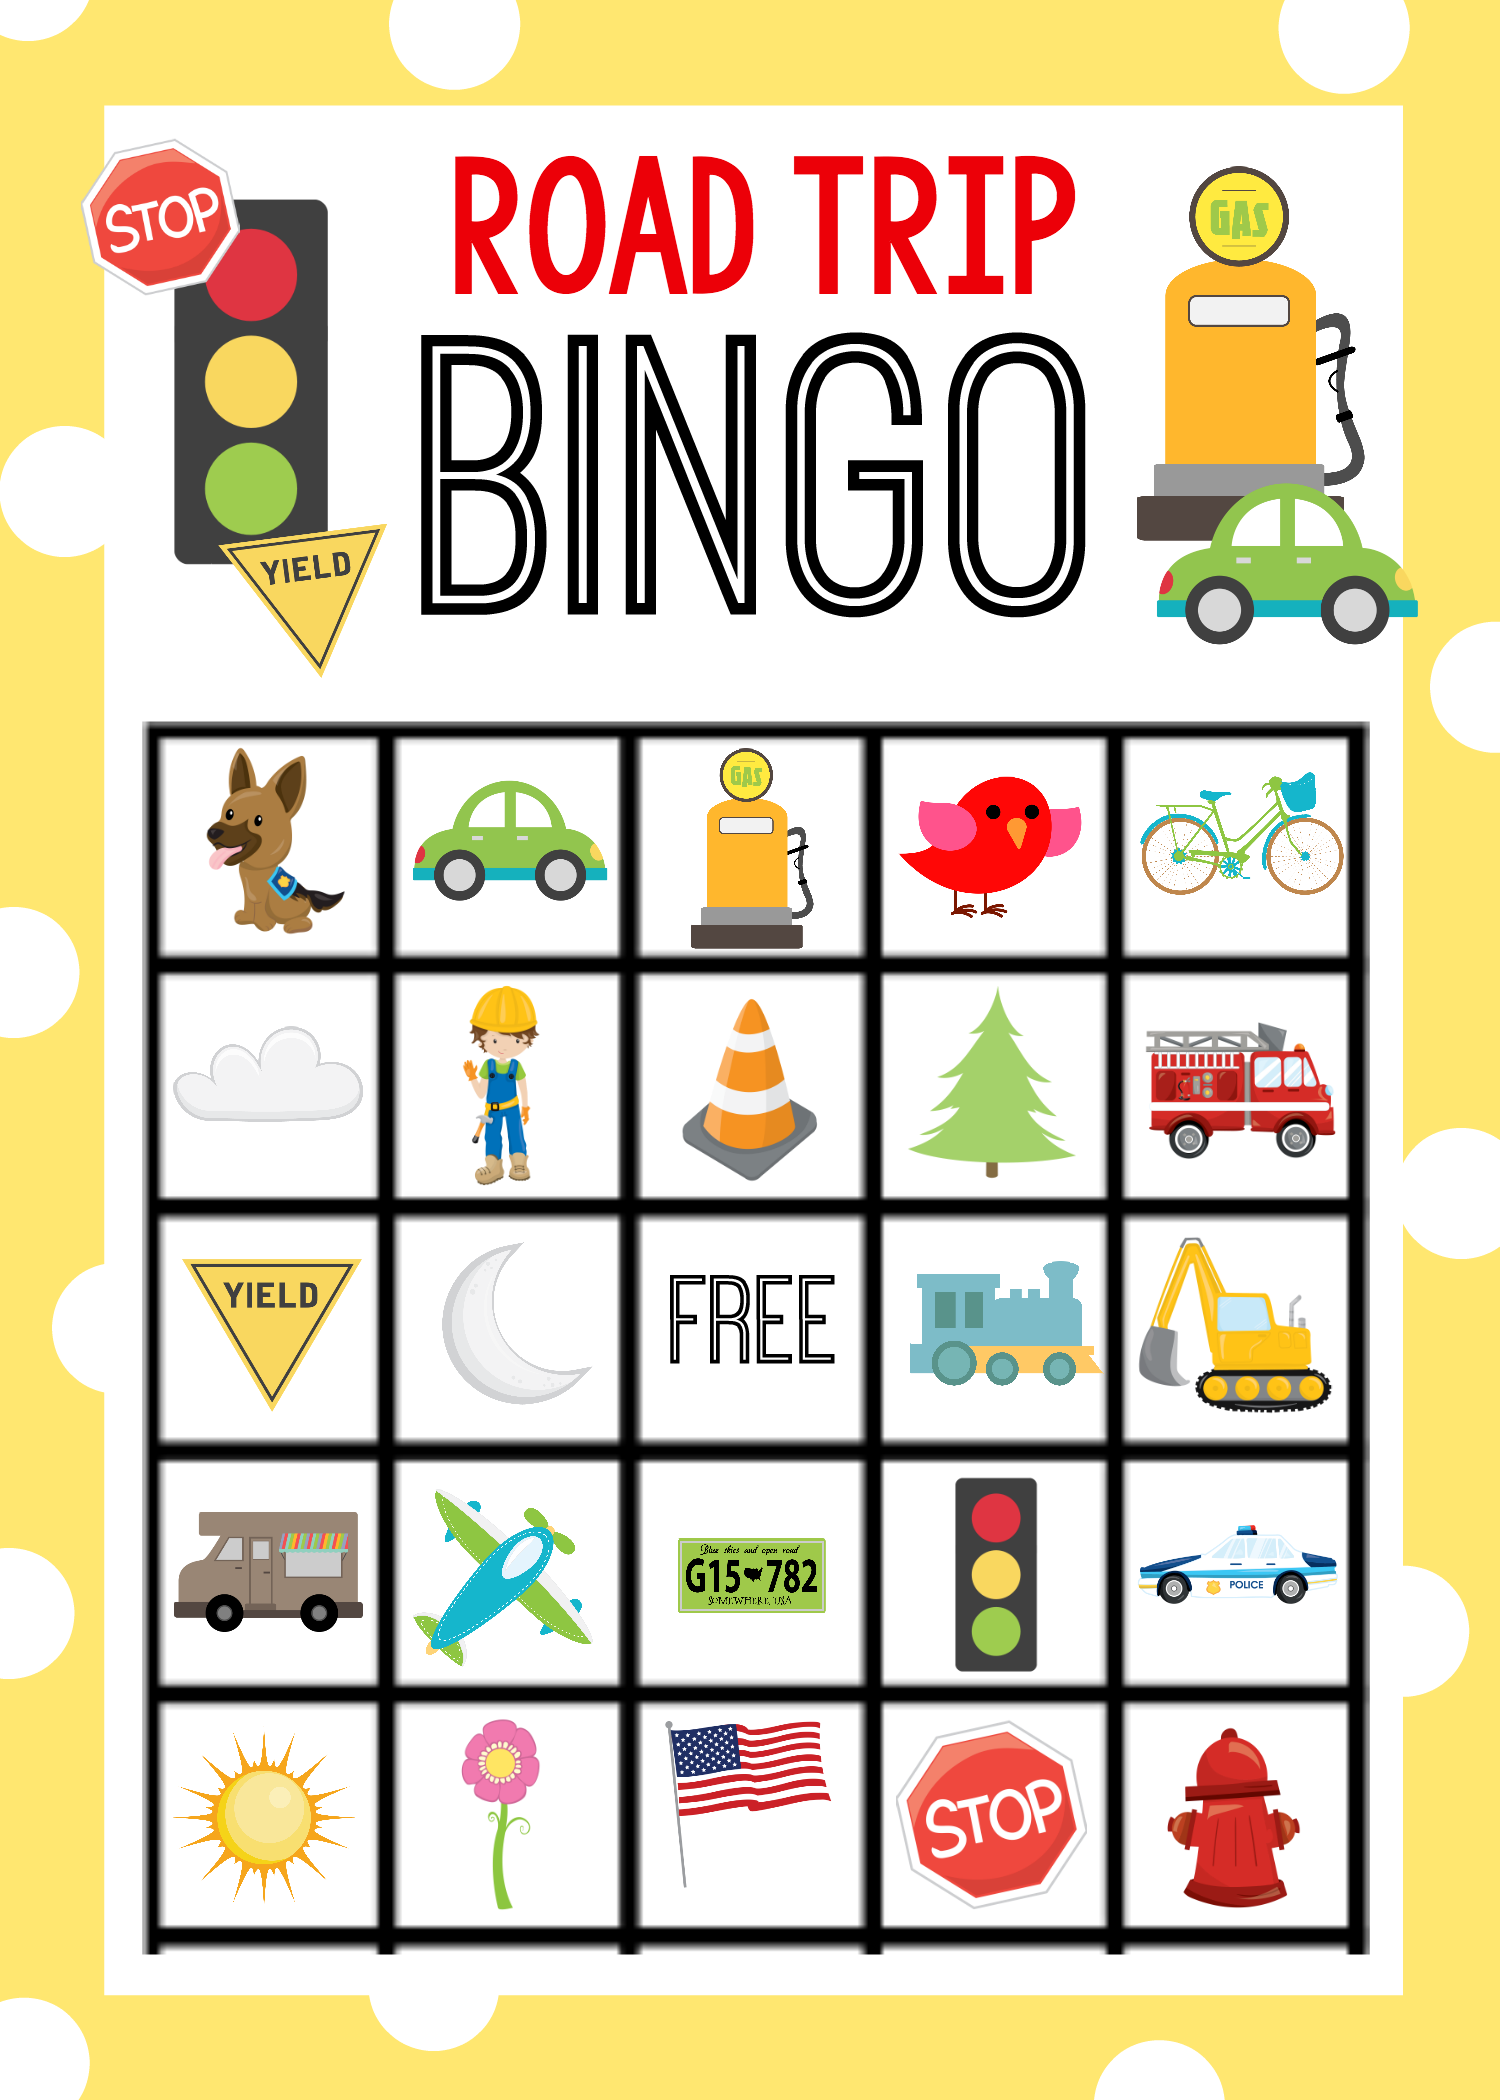 Jingo bingo prizes for children